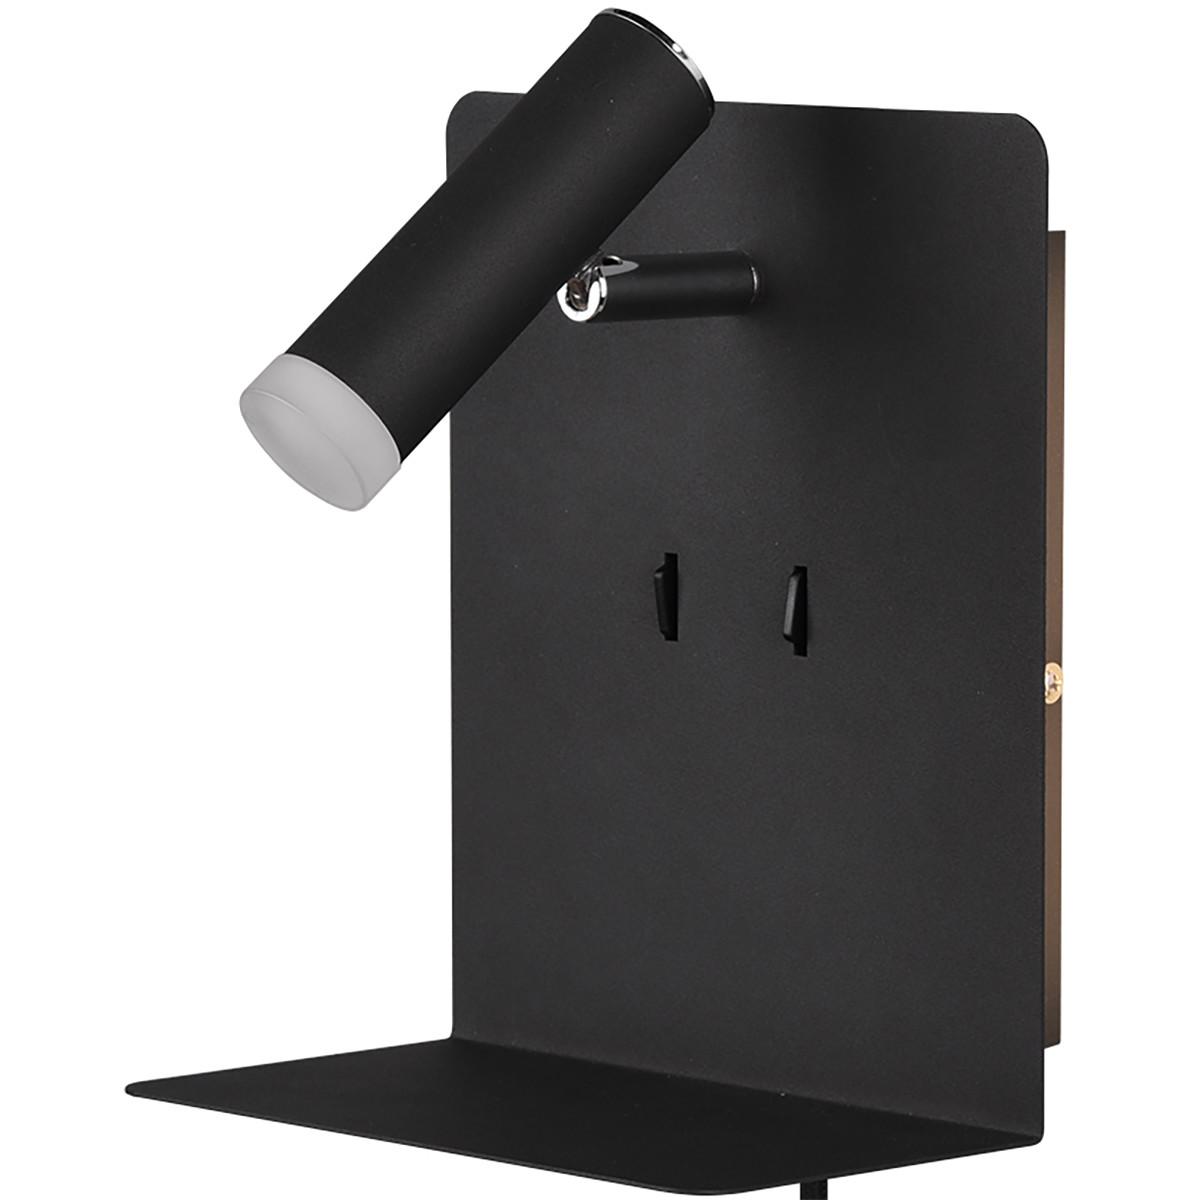 LED Wandlamp - Trion Elonant - 6W - Warm Wit 3000K - USB Oplaadfunctie - Mat Zwart - Aluminium